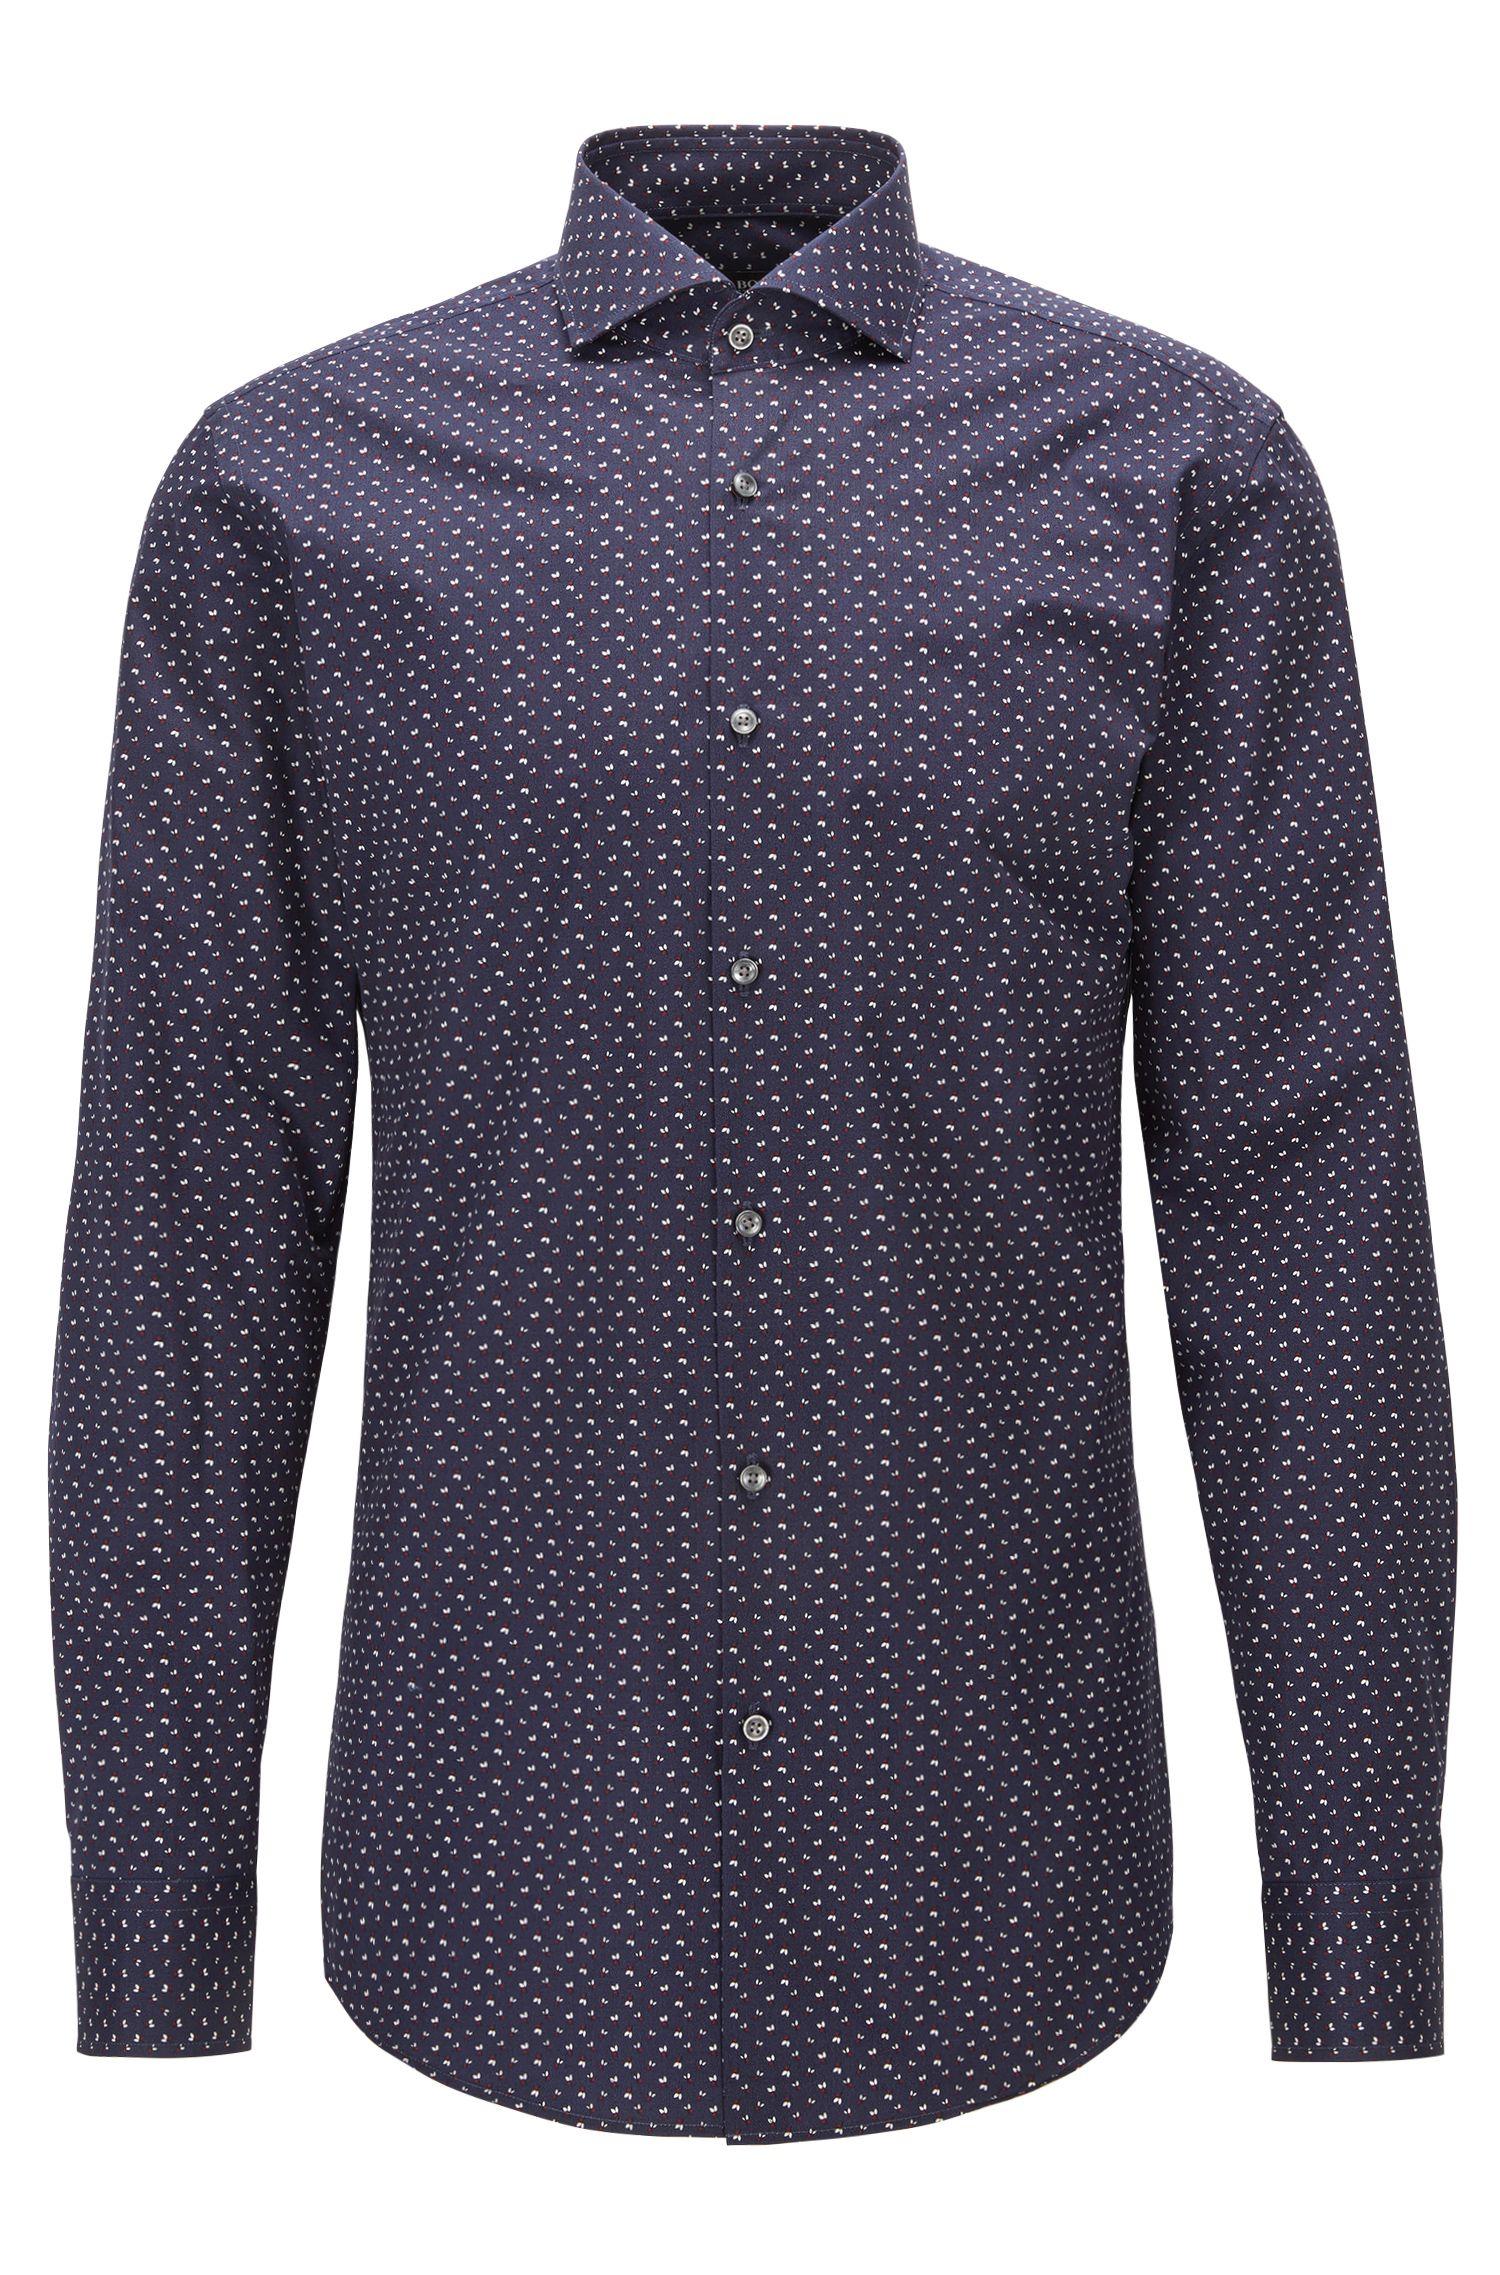 Firefly Cotton Dress Shirt, Slim Fit   Jason